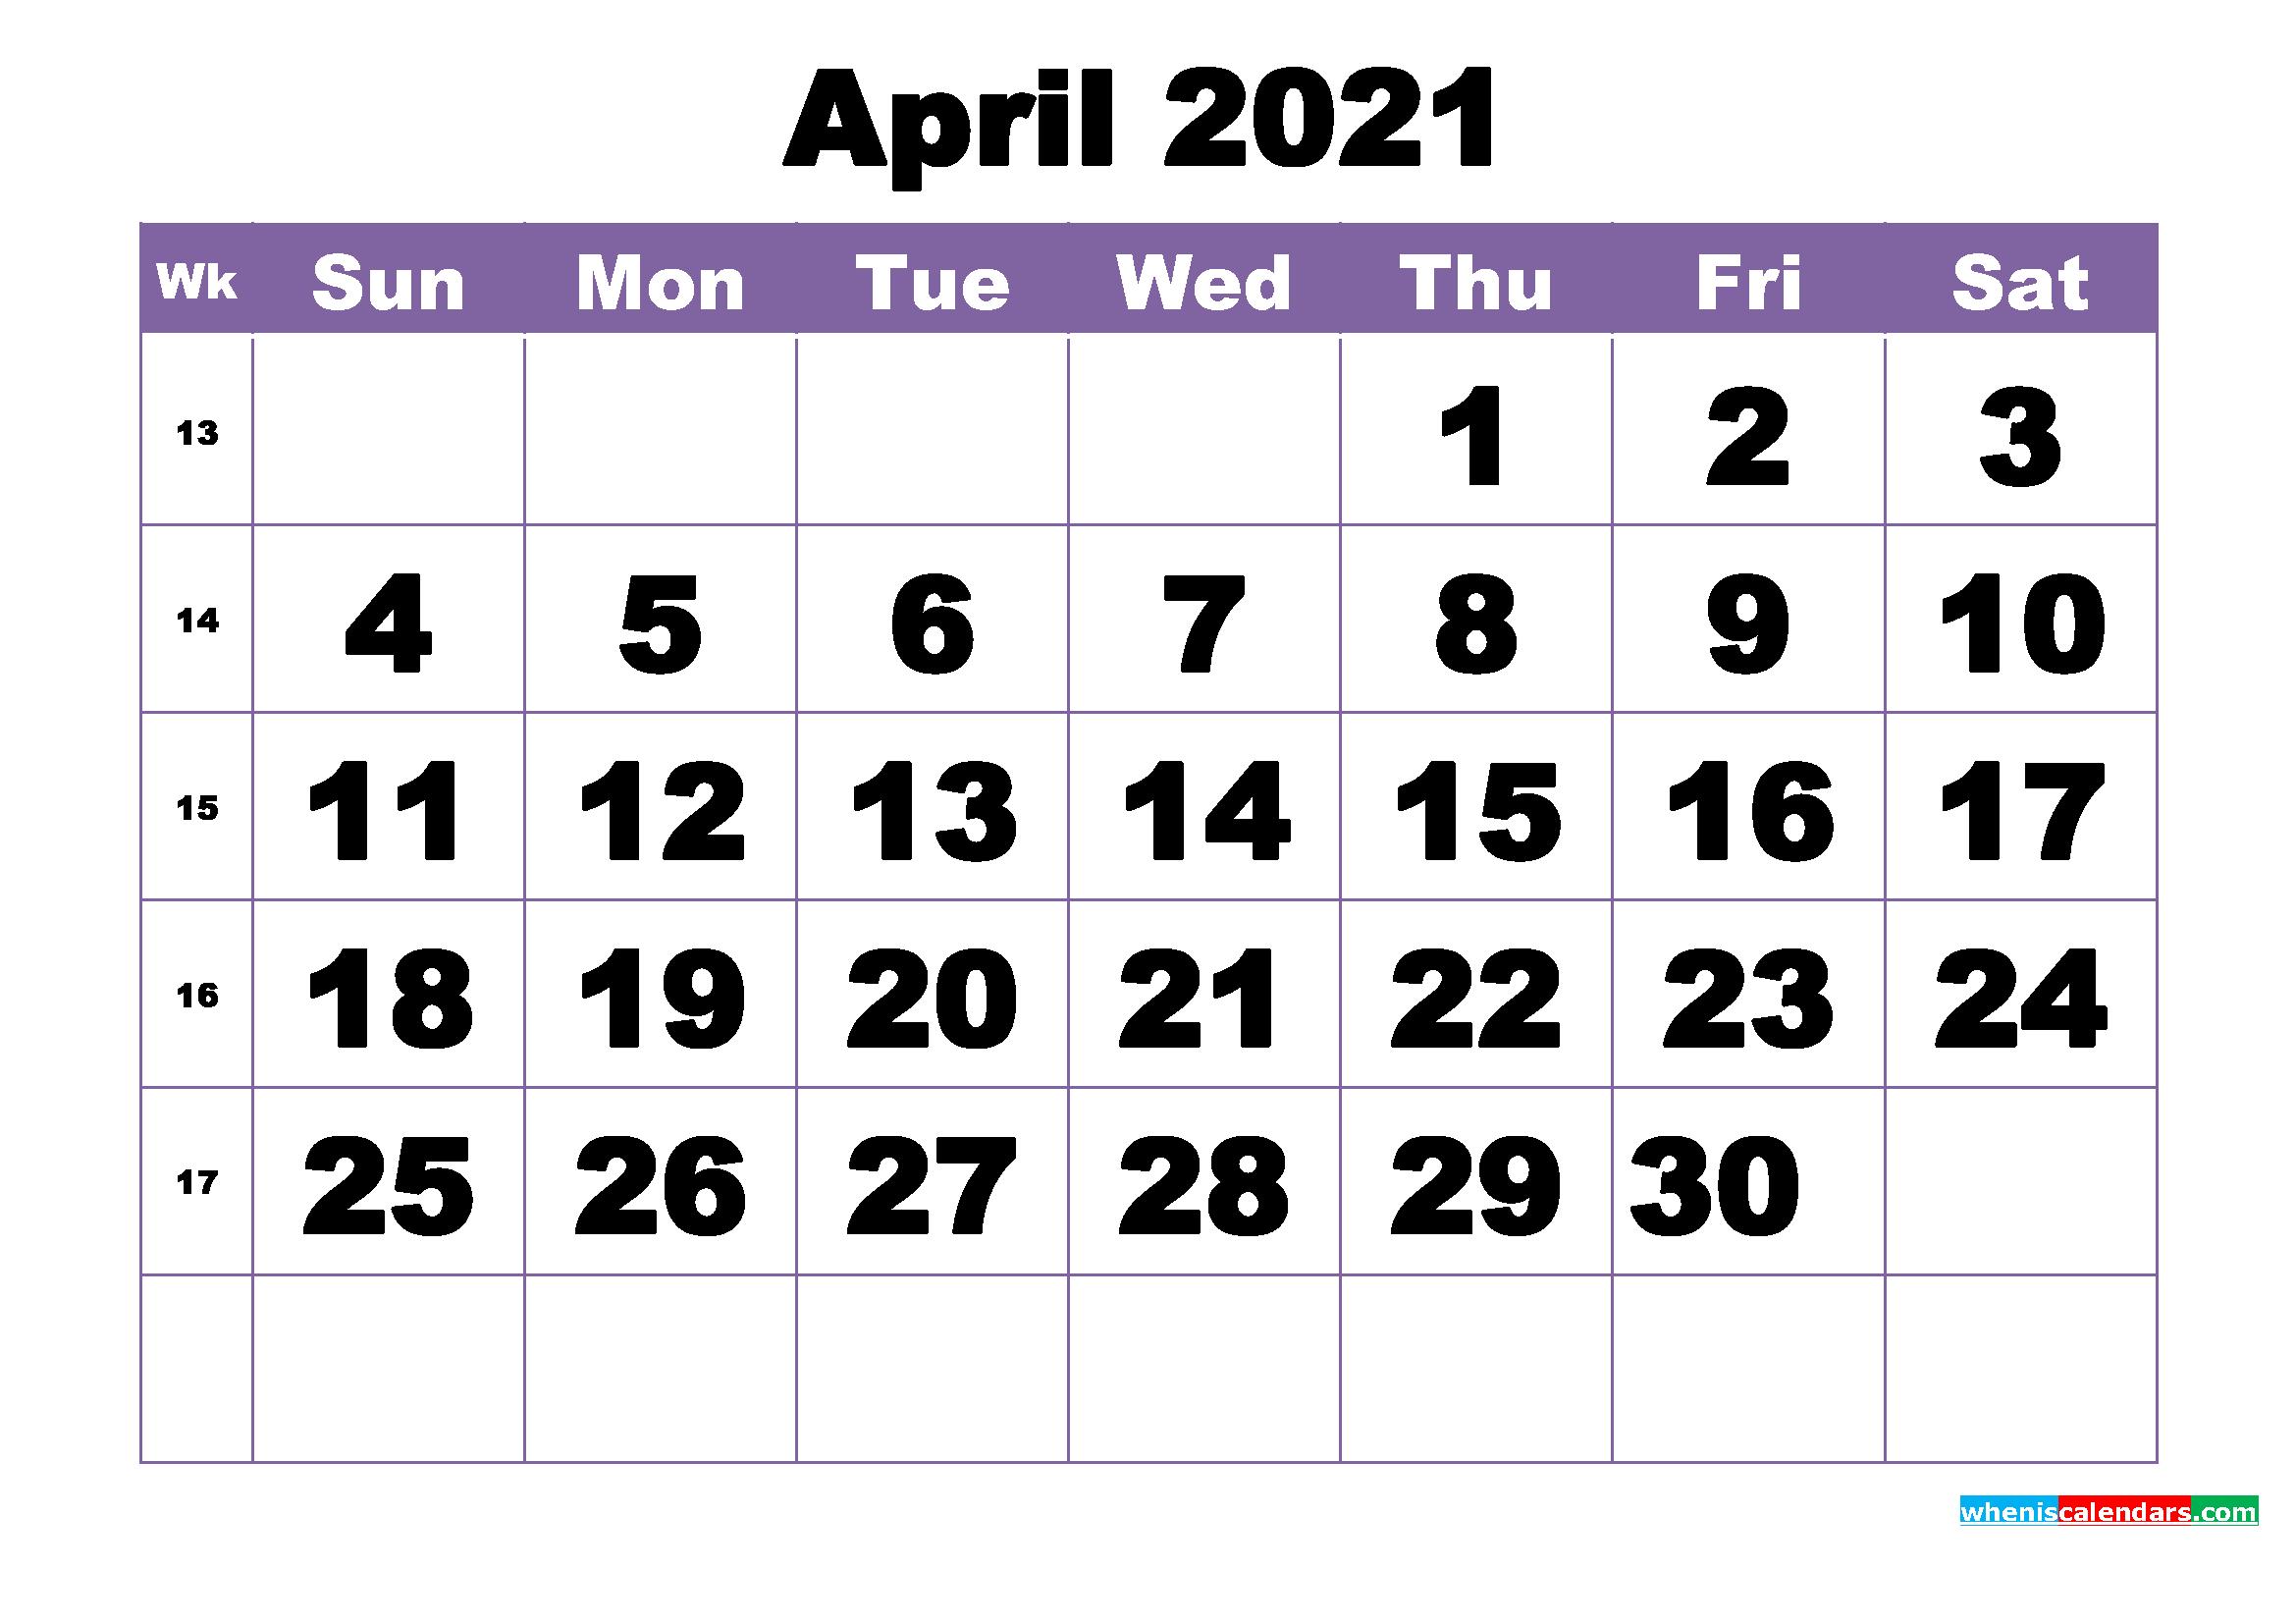 April 2021 Printable Calendar Template   Free Printable ...